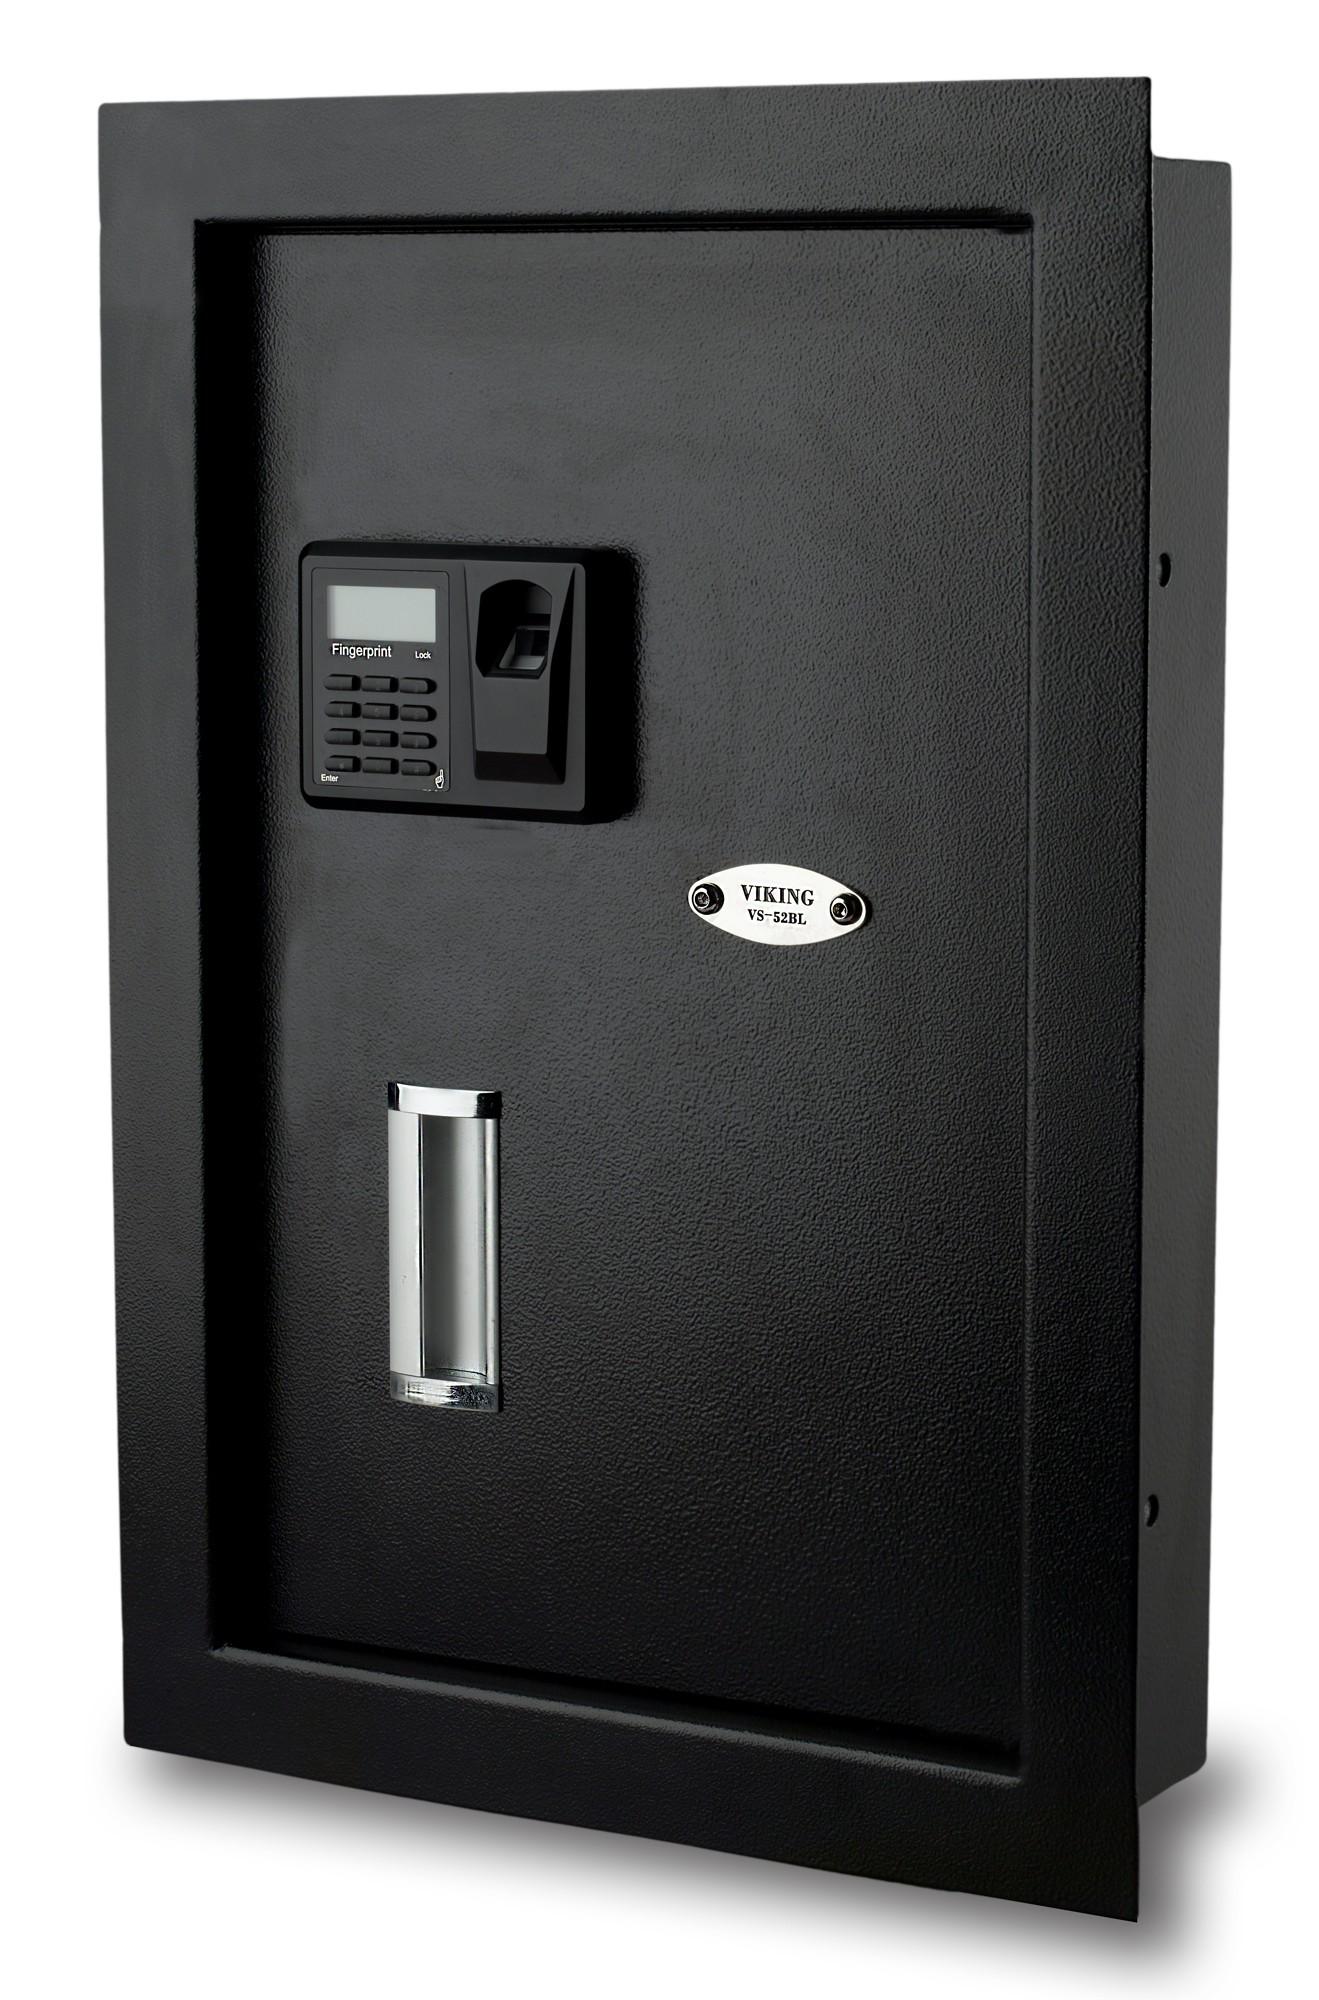 Viking Security Safe VS-52BL Hidden Wall Biometric Fingerprint LCD Keypad Safe